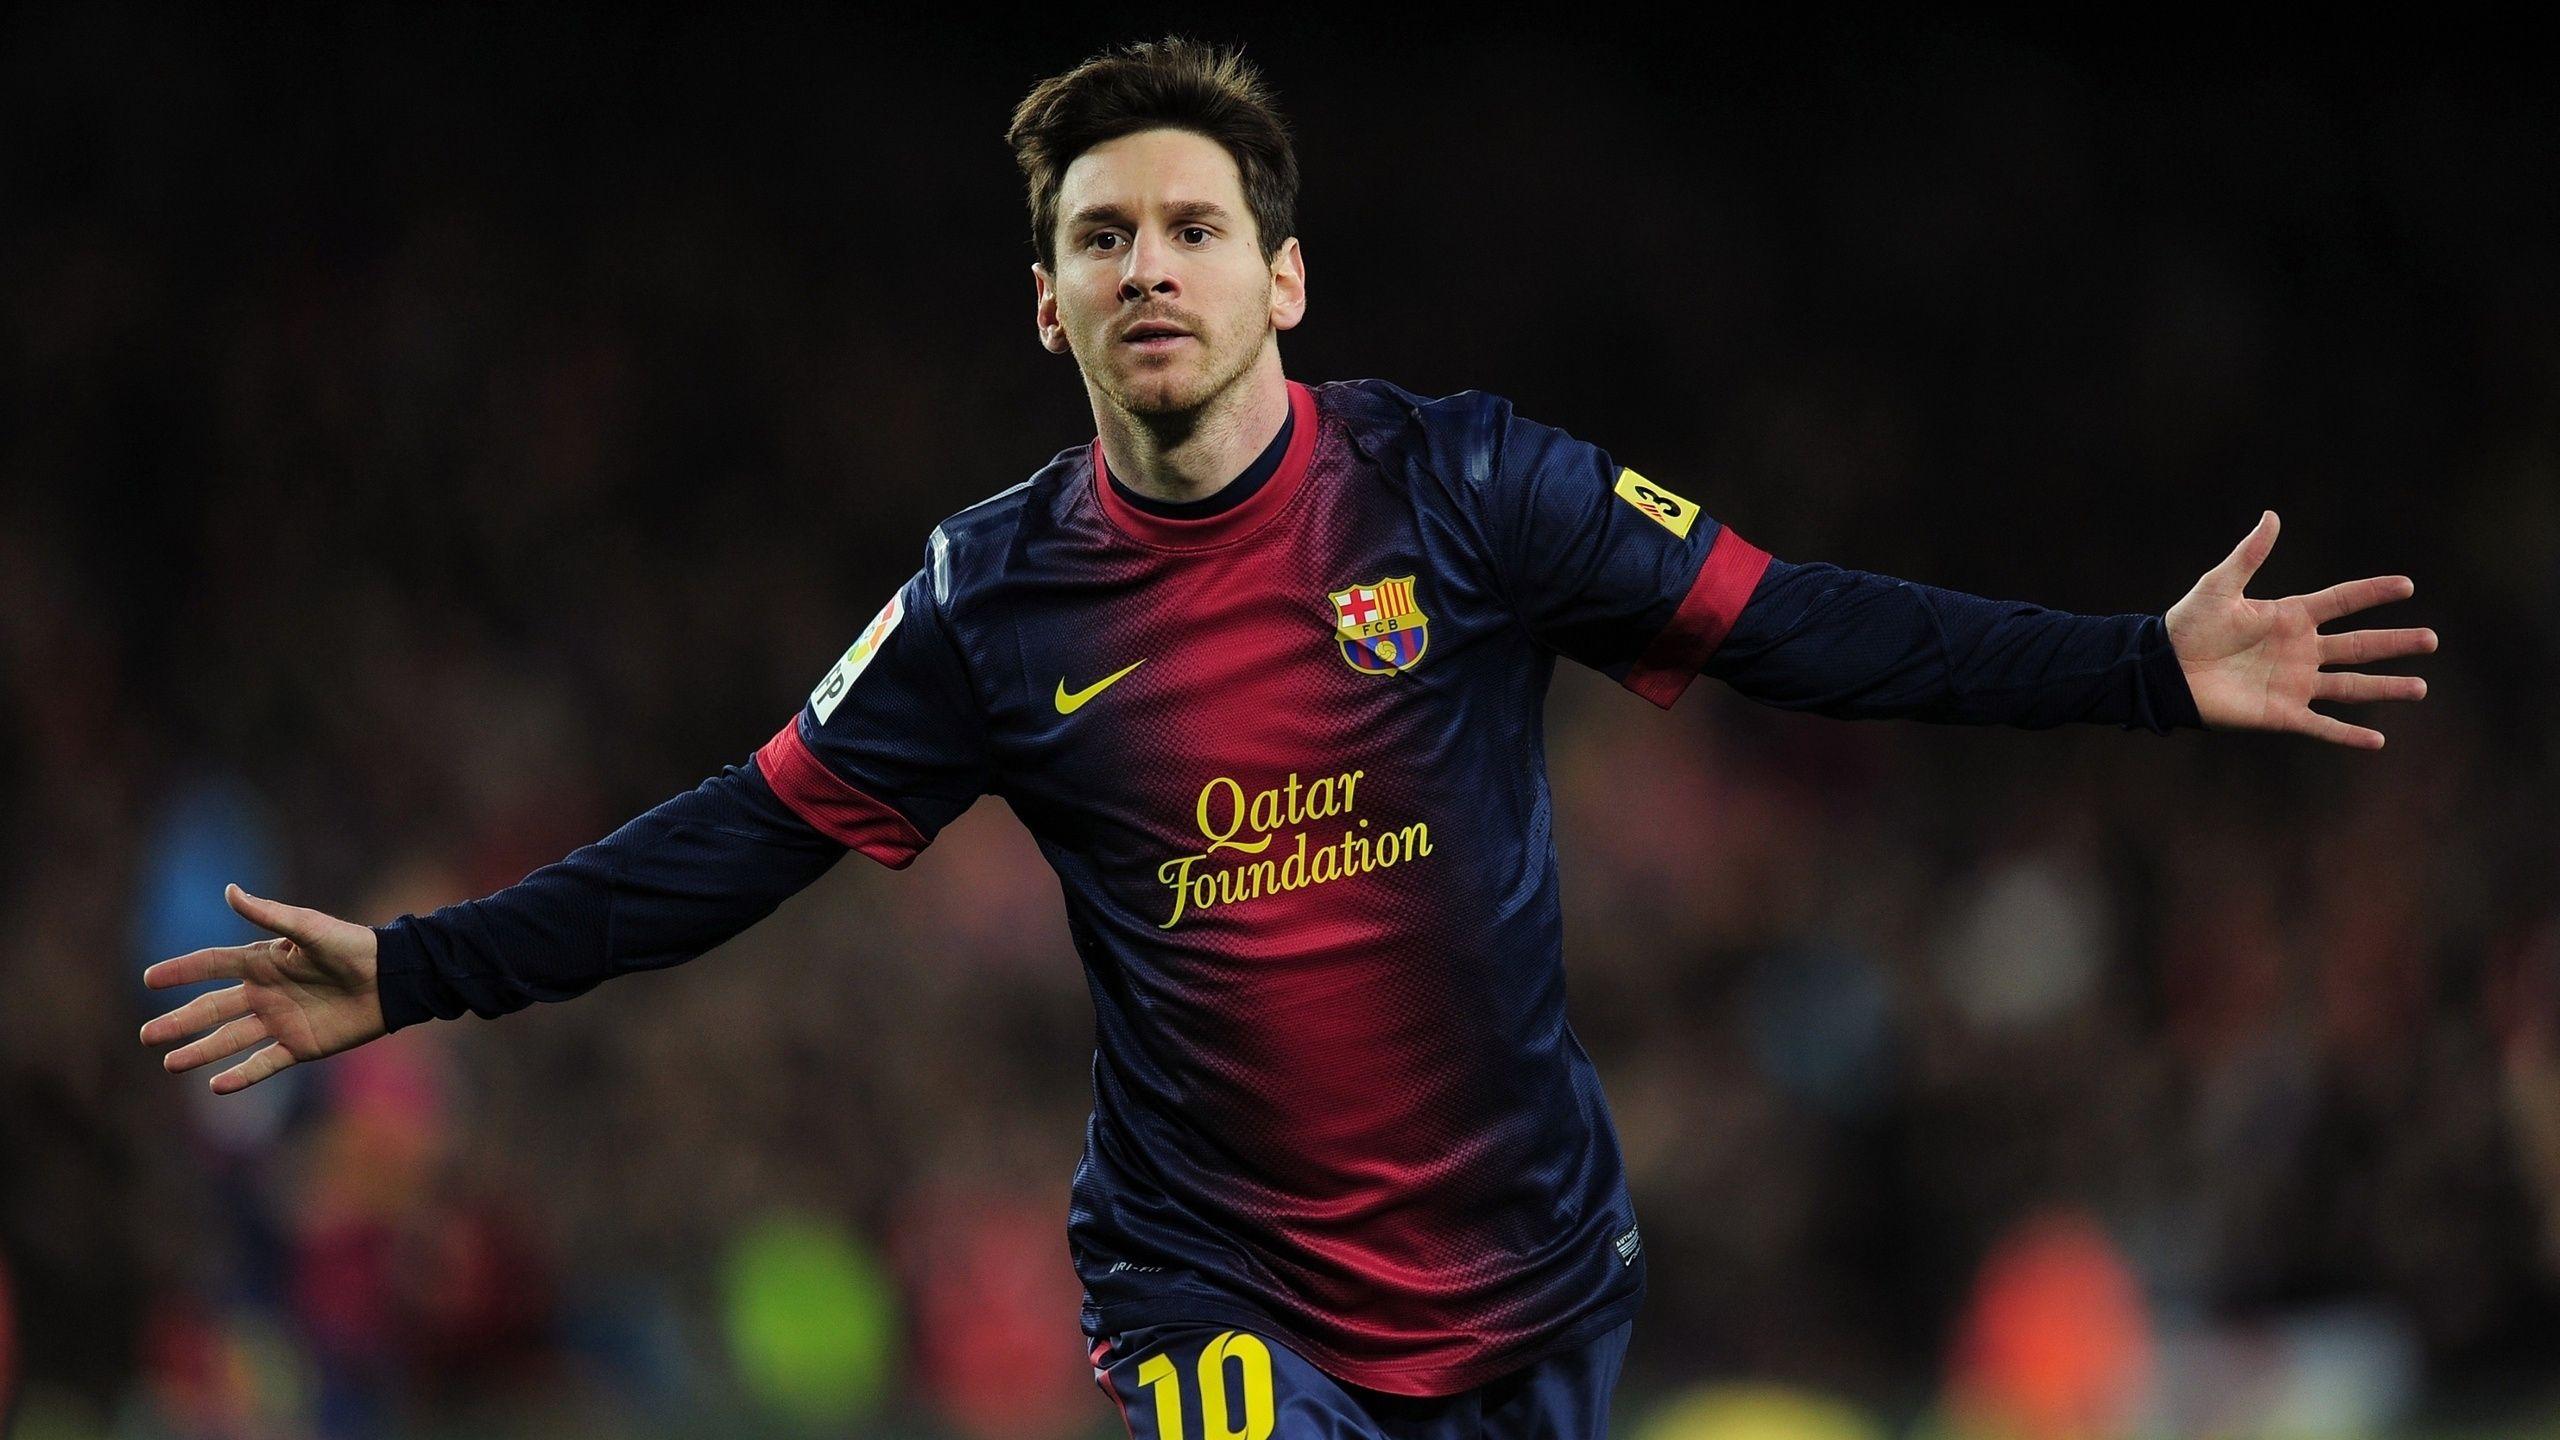 10 Most Popular Lionel Messi Hd Wallpapers Full Hd 1080p For Pc Desktop Lionel Messi Lionel Messi Wallpapers Lionel Messi Skills